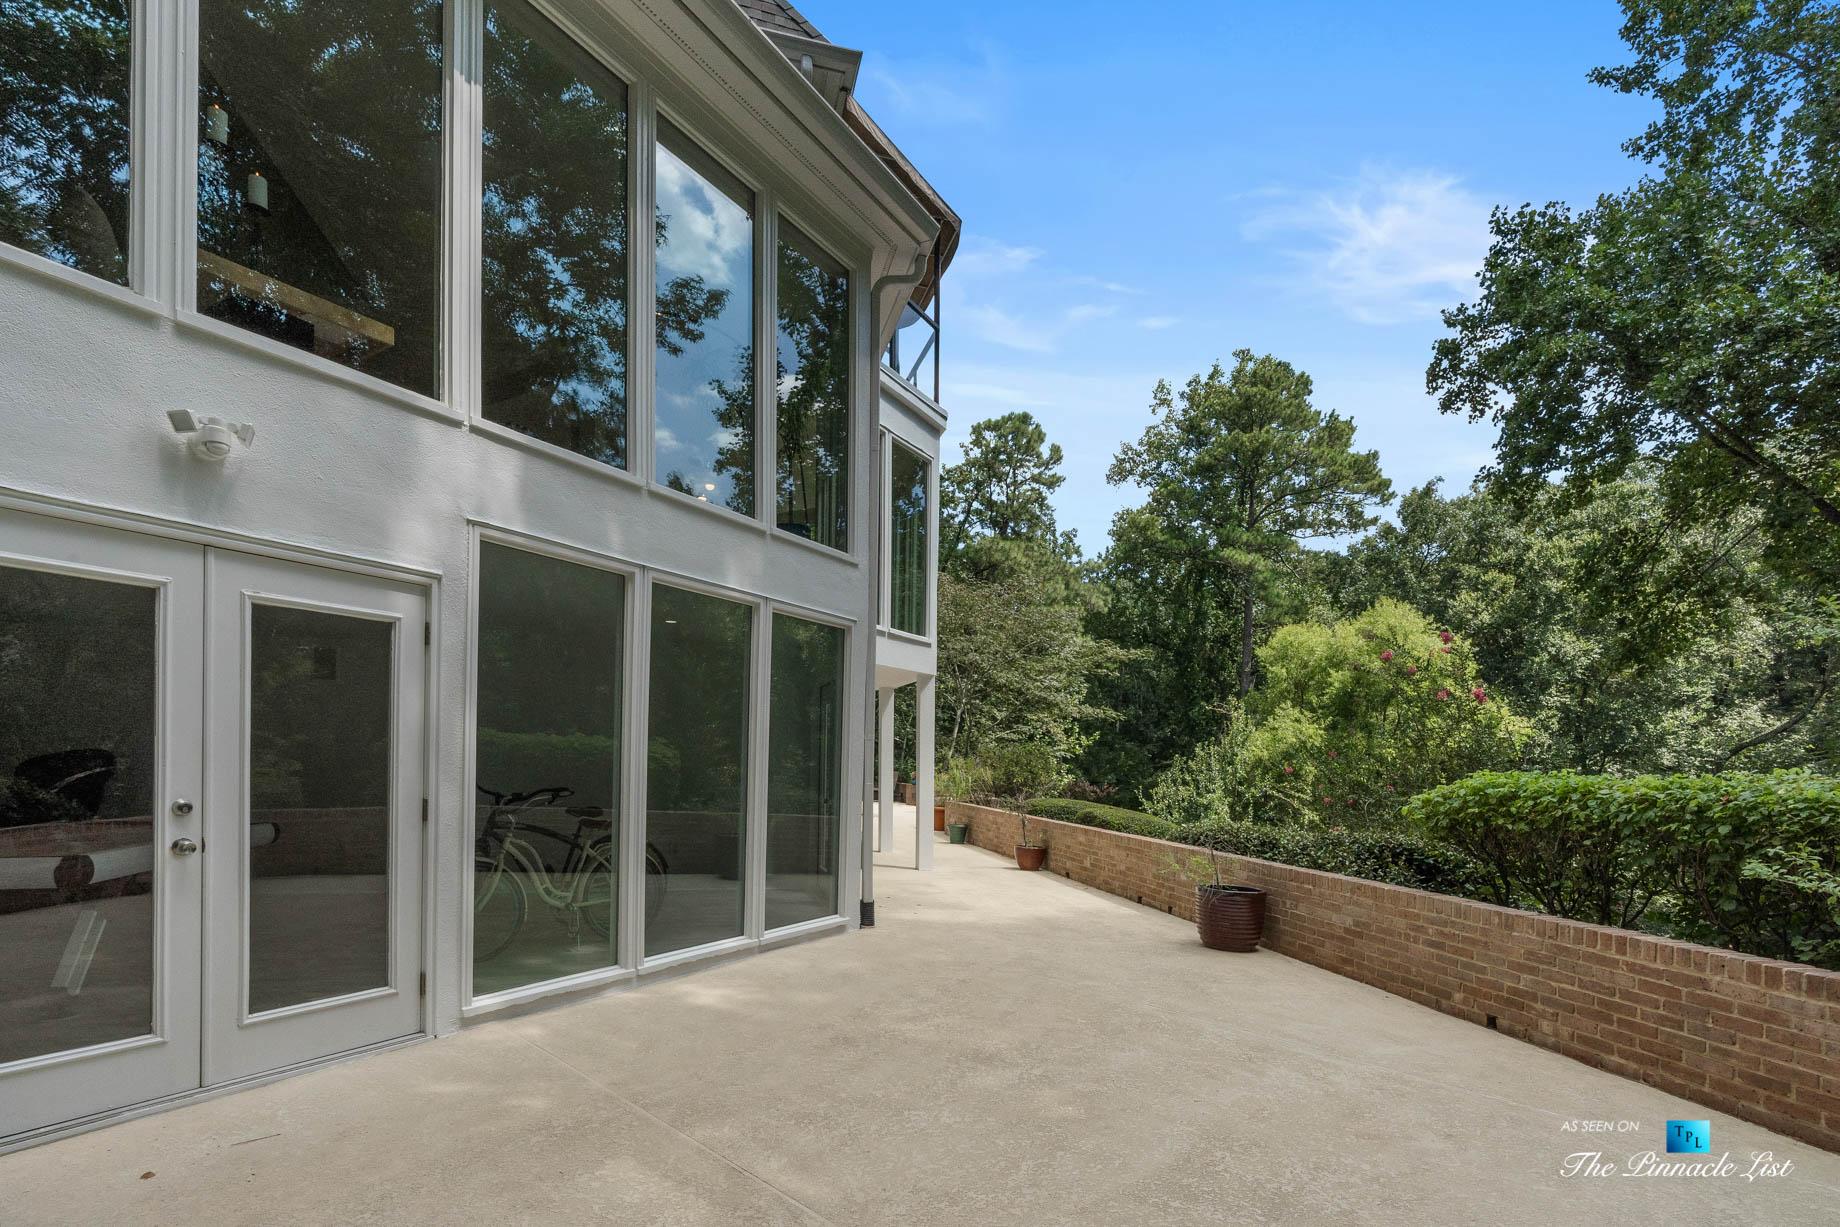 Luxury Real Estate - 3906 Paces Ferry Rd NW, Atlanta, GA, USA